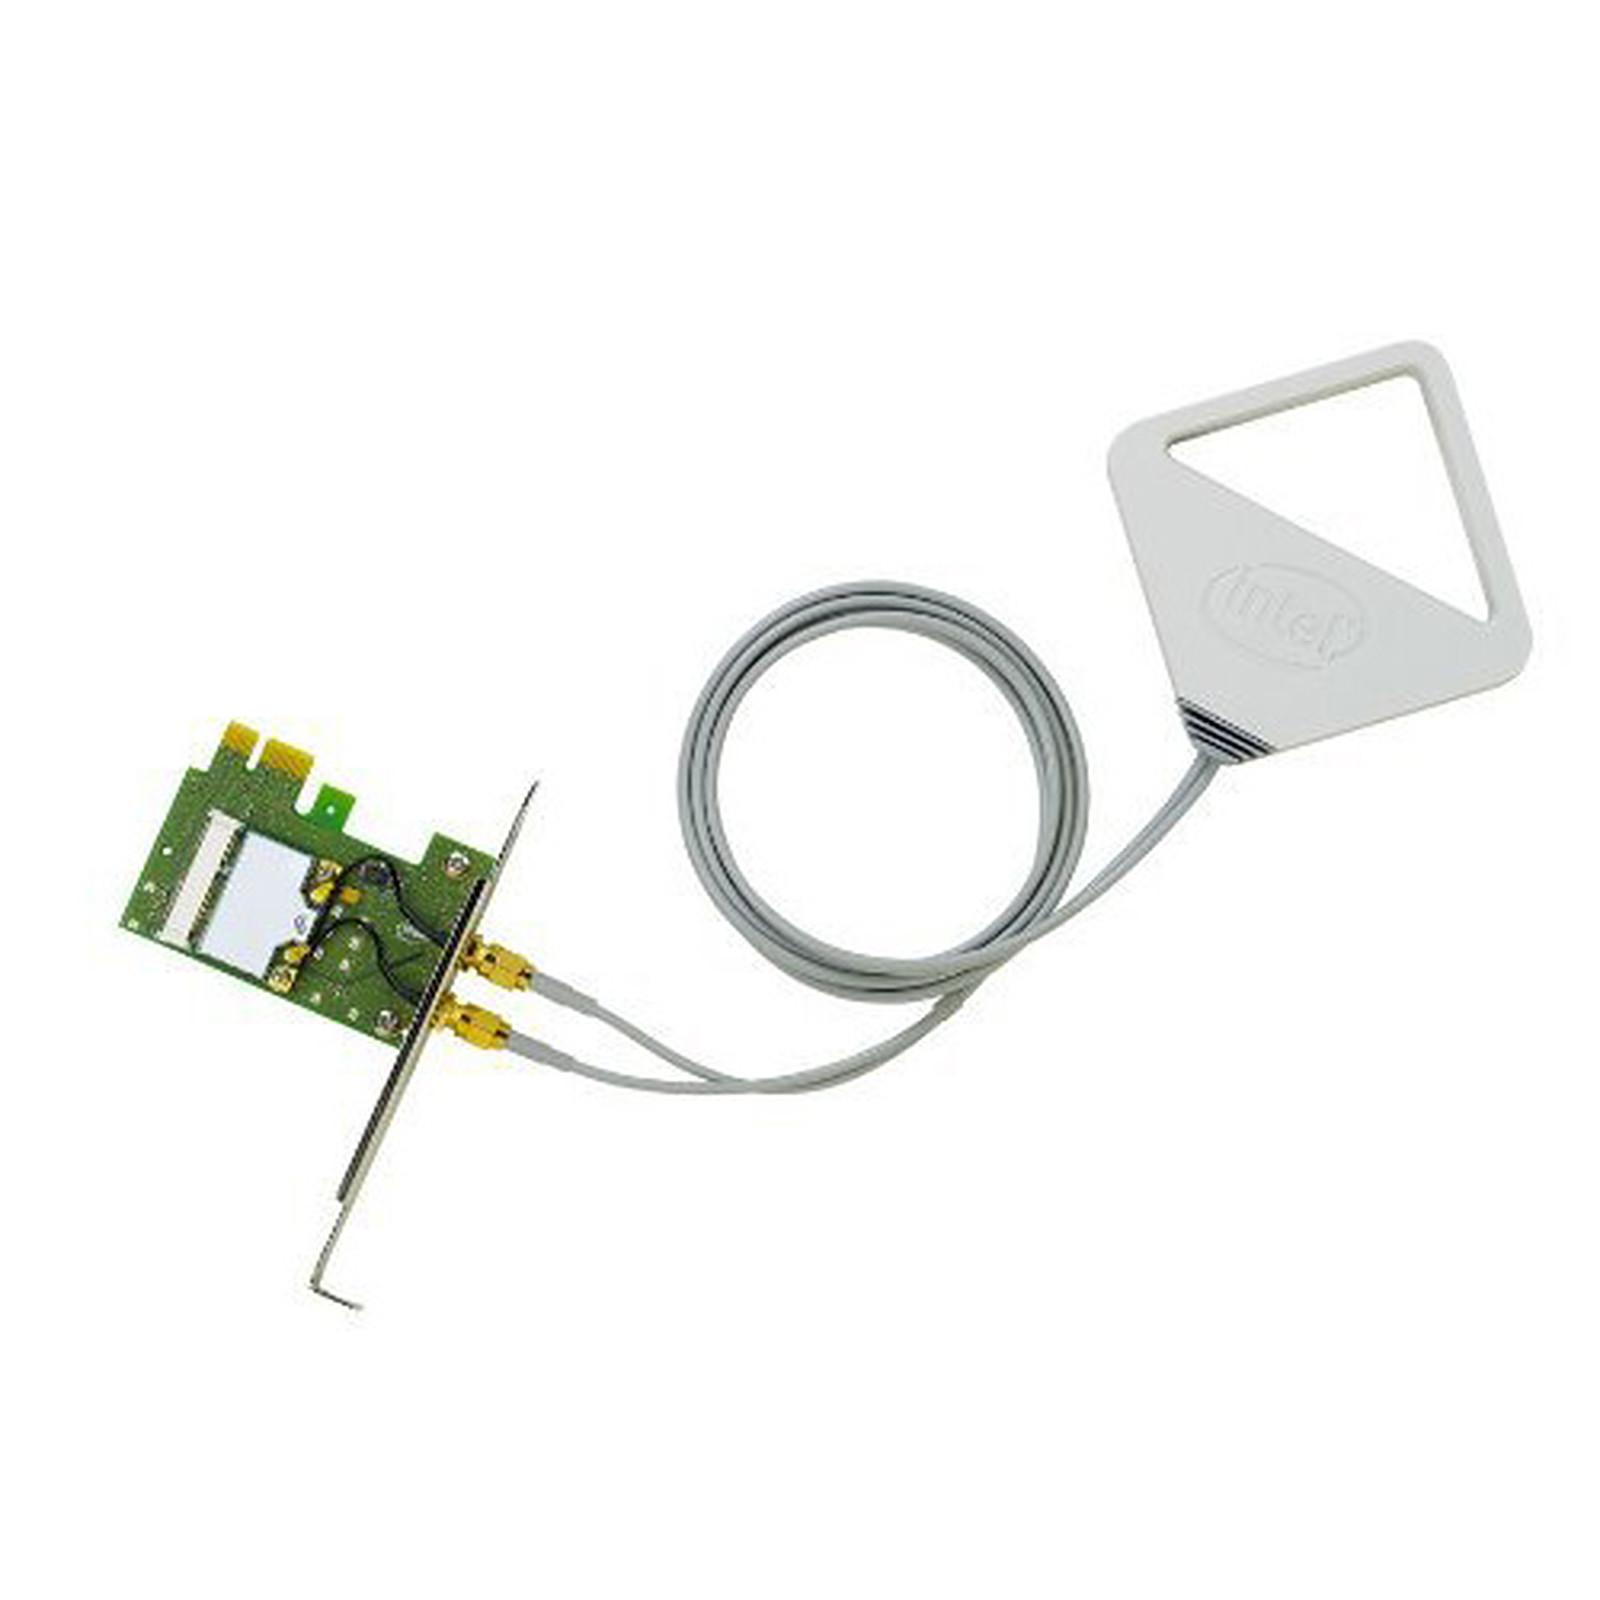 Intel Centrino Dual Band Wireless-AC 7260 + Bluetooth Adapter (version bulk)